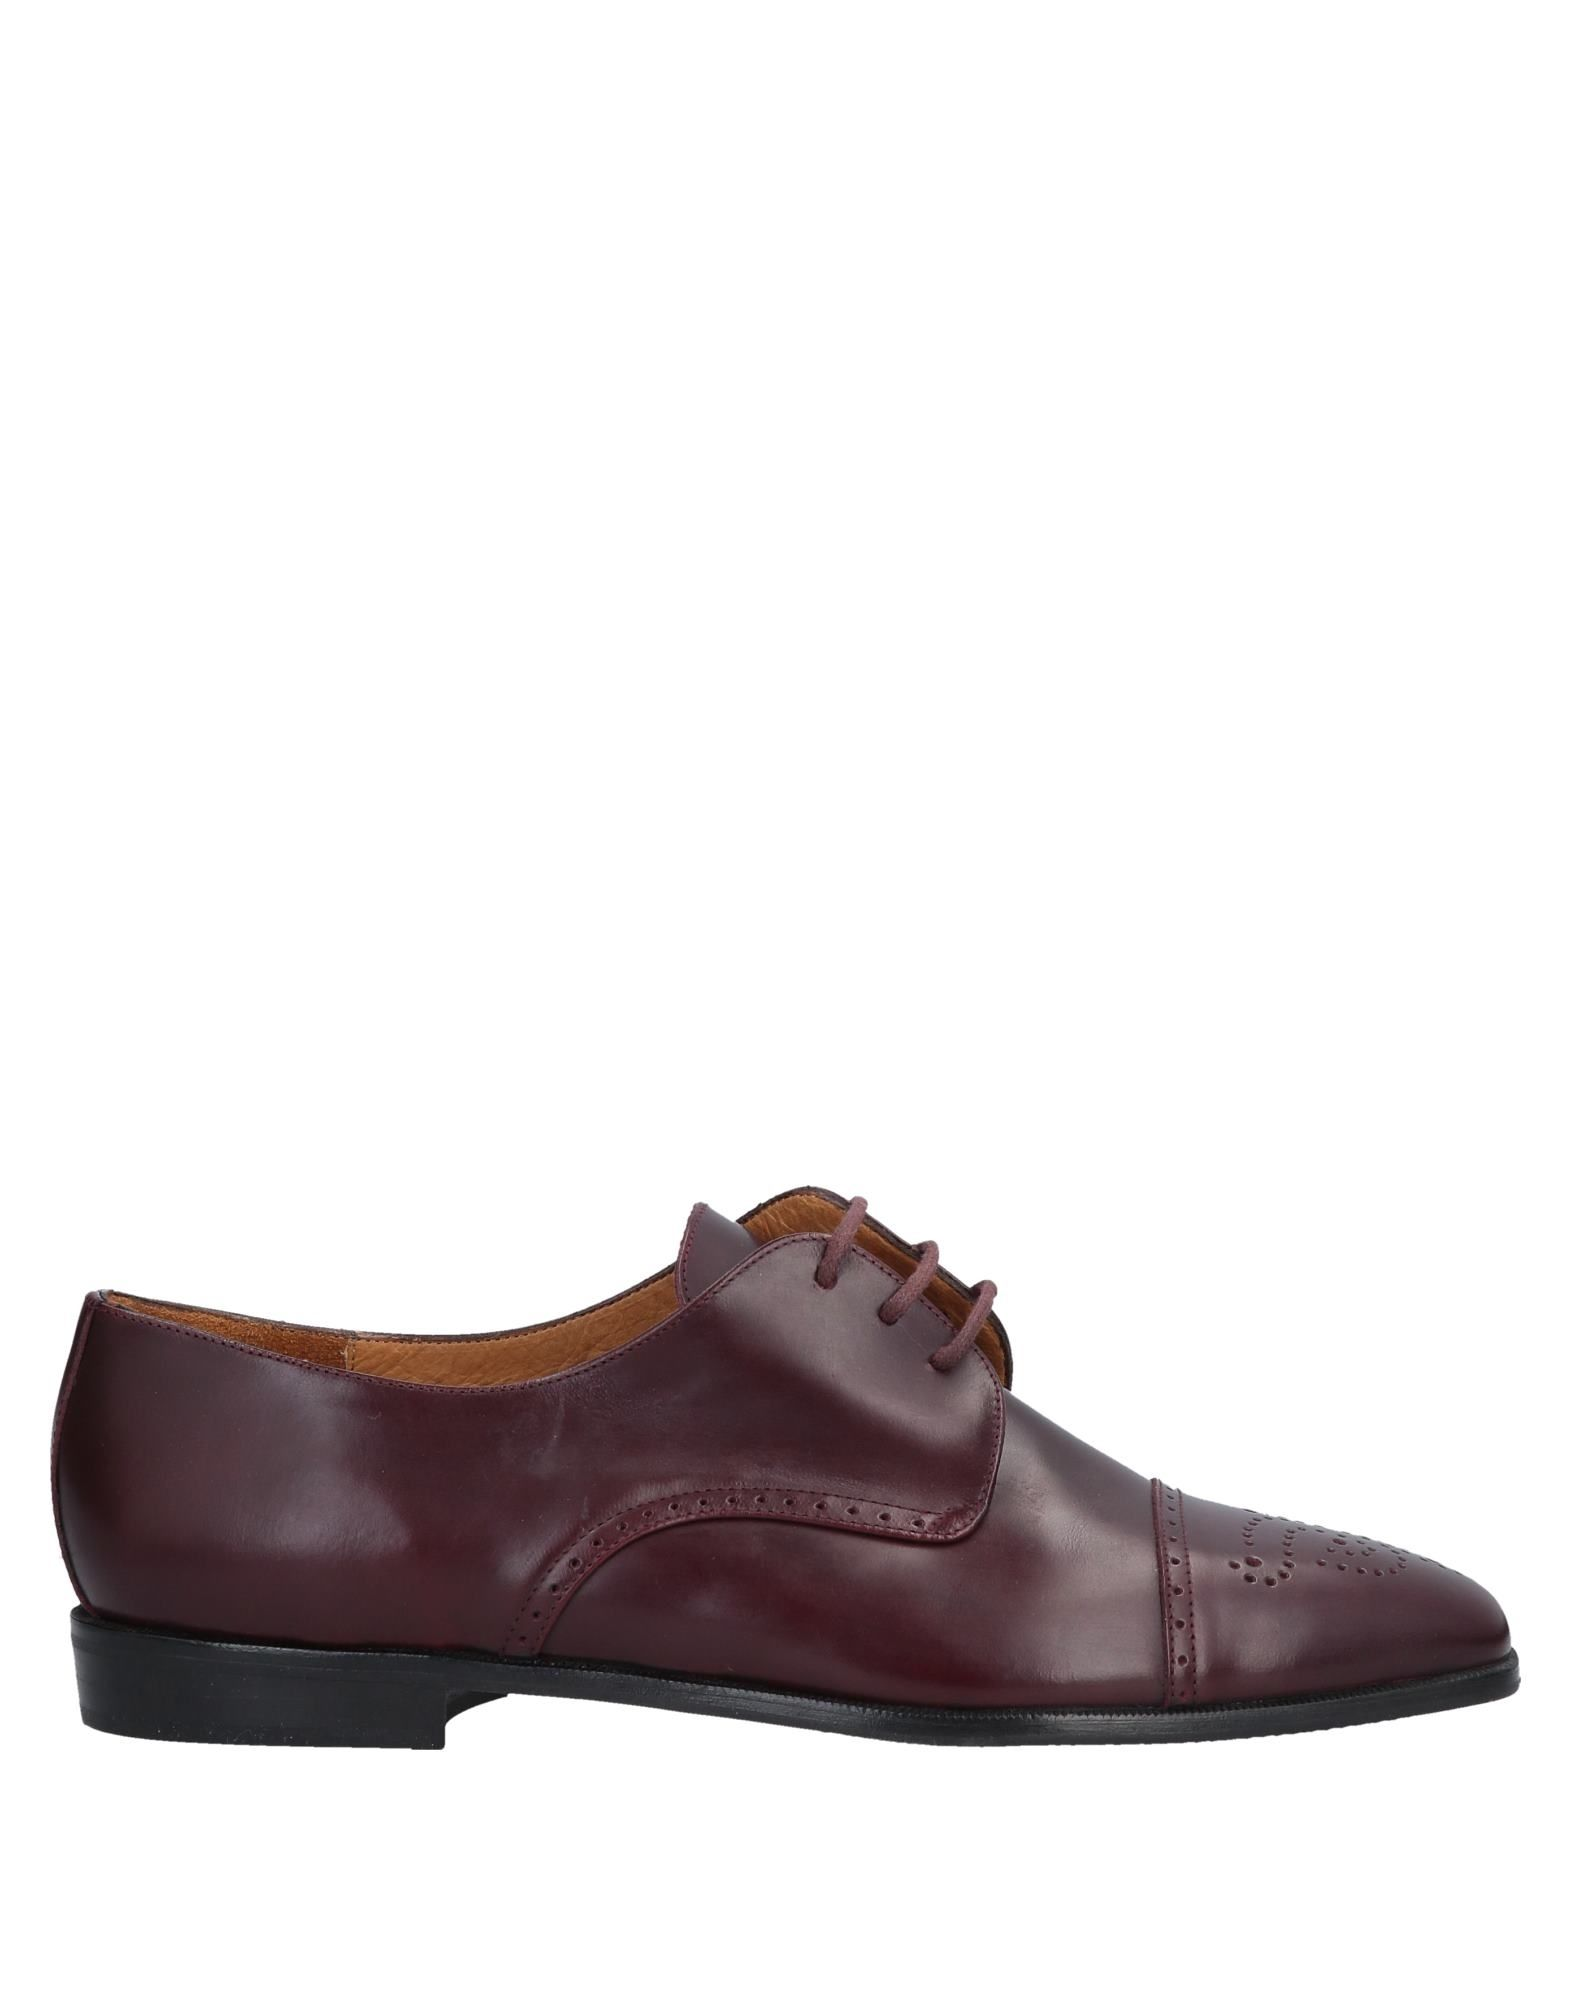 MODA ITALIA Обувь на шнурках griff italia обувь на шнурках